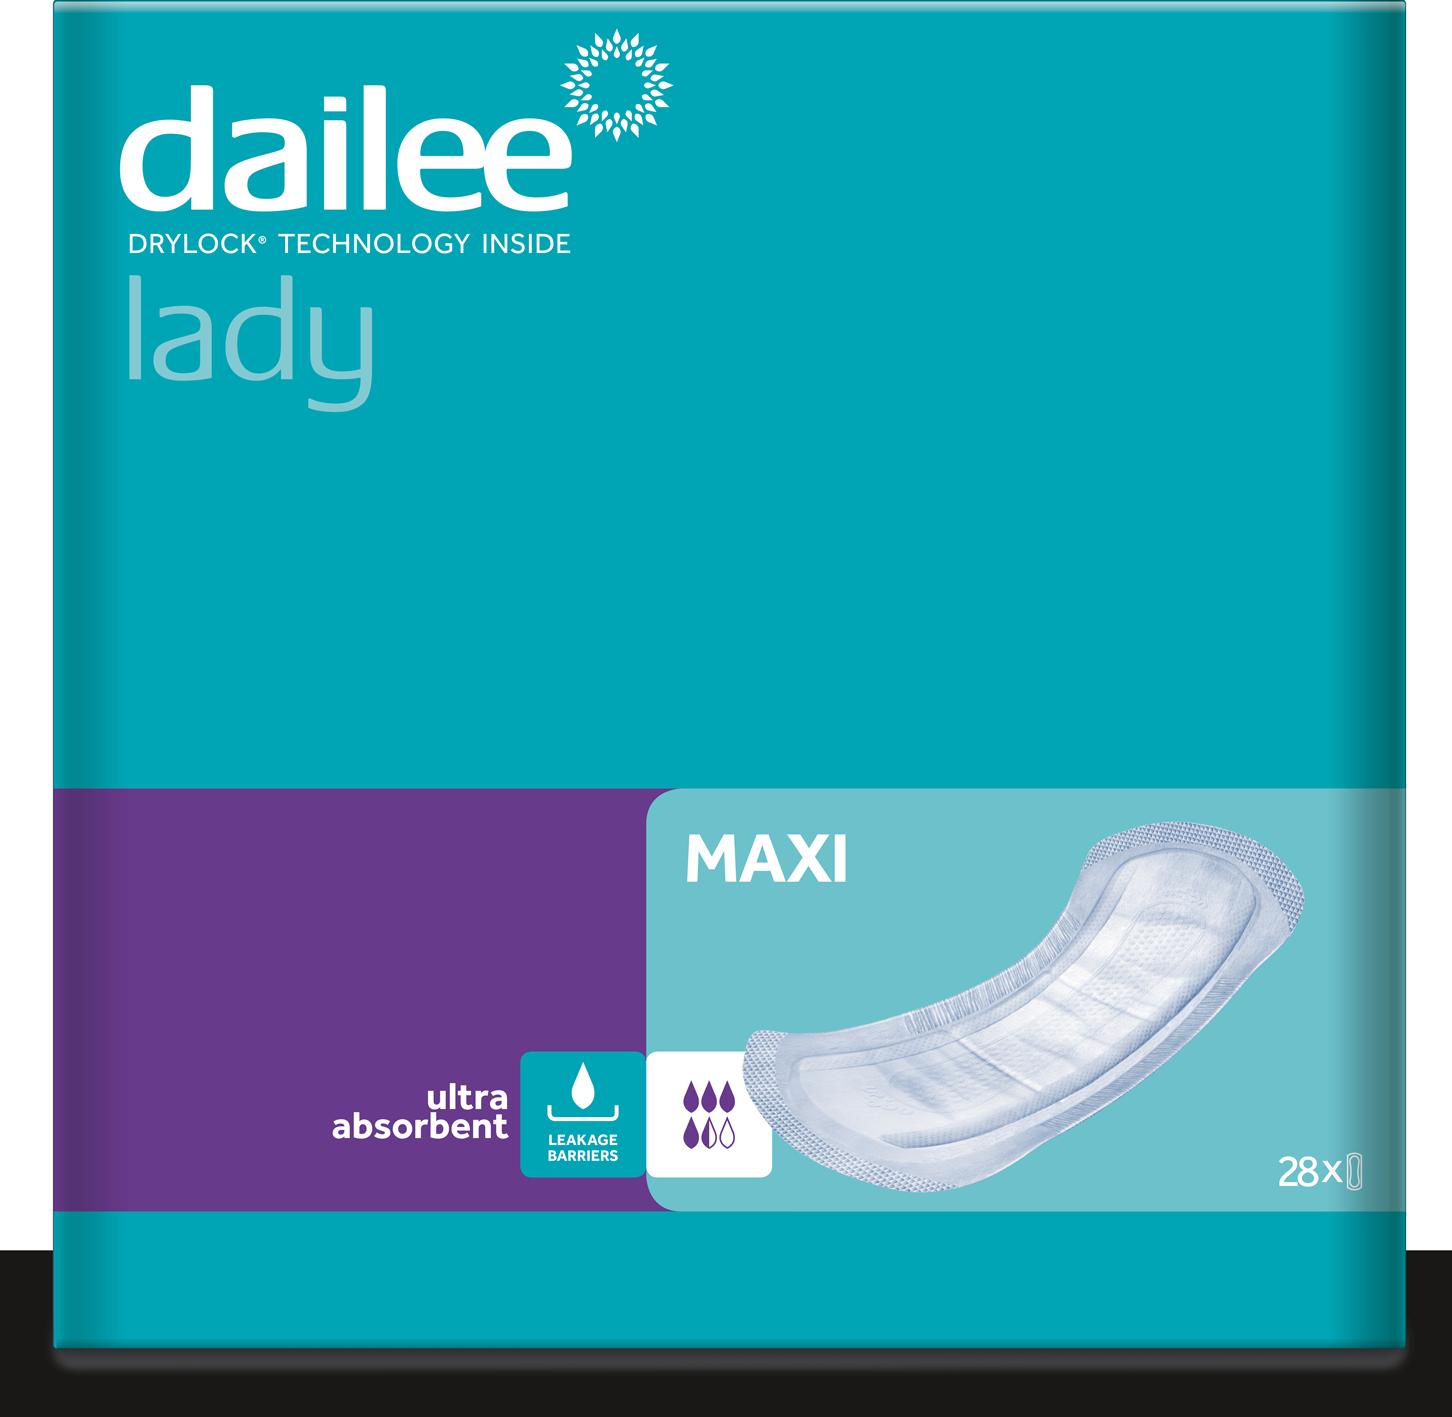 Dailee lady maxi